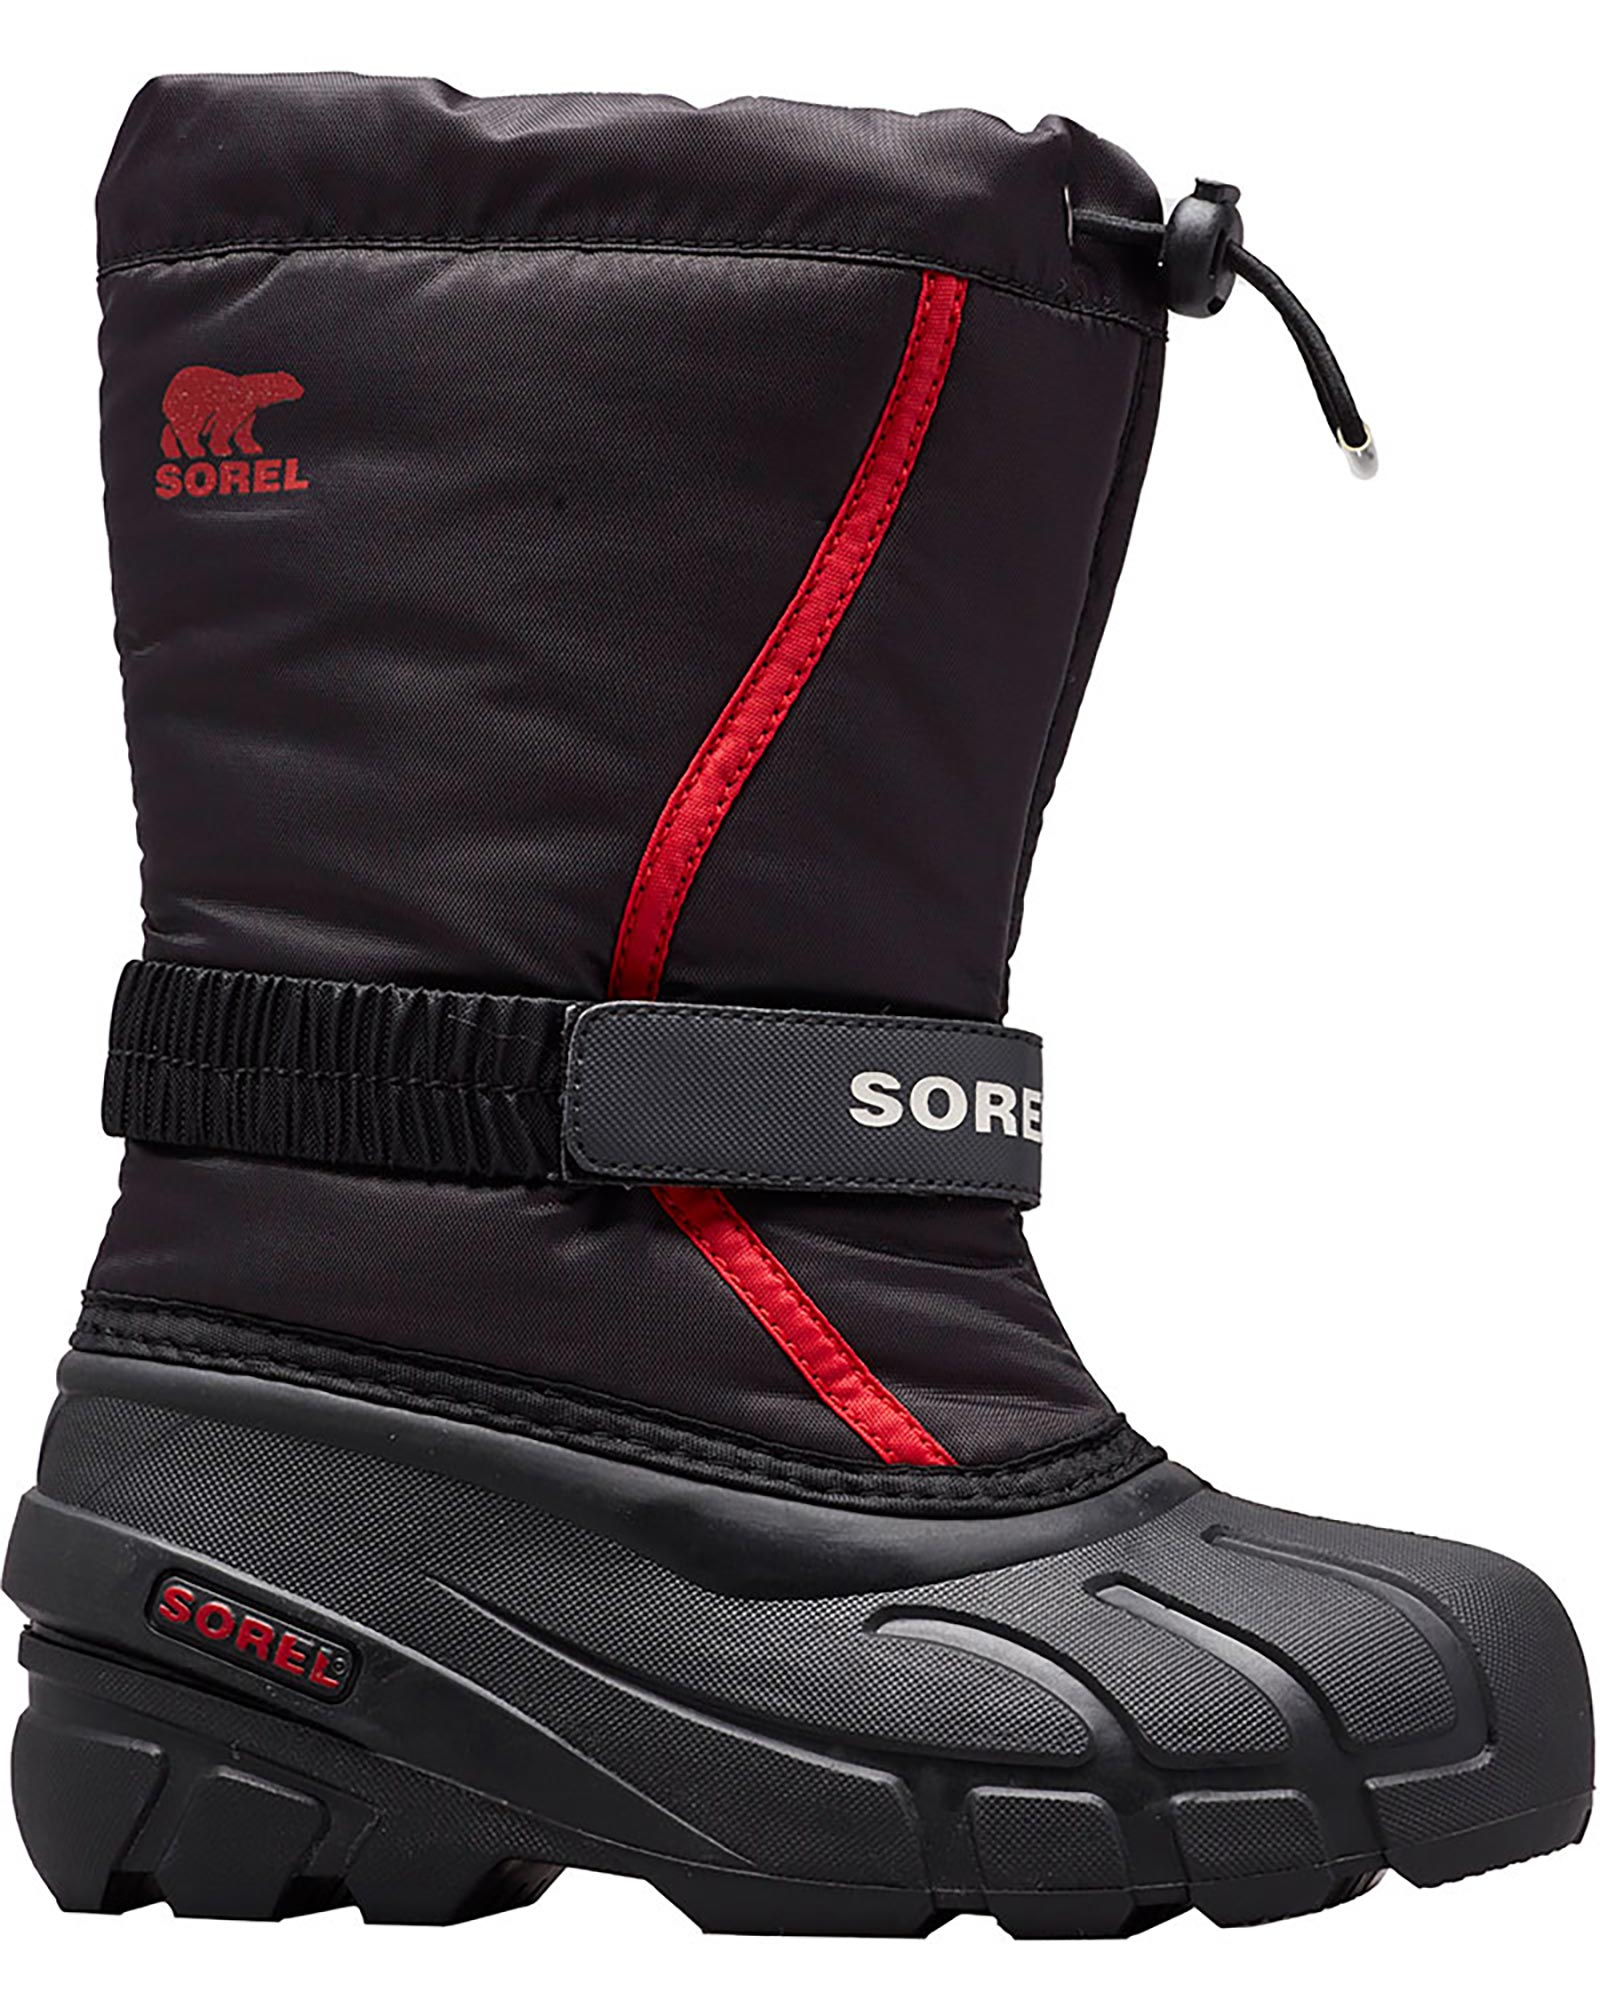 Sorel Mens Cheyanne Lace Full Grain Snow Boots